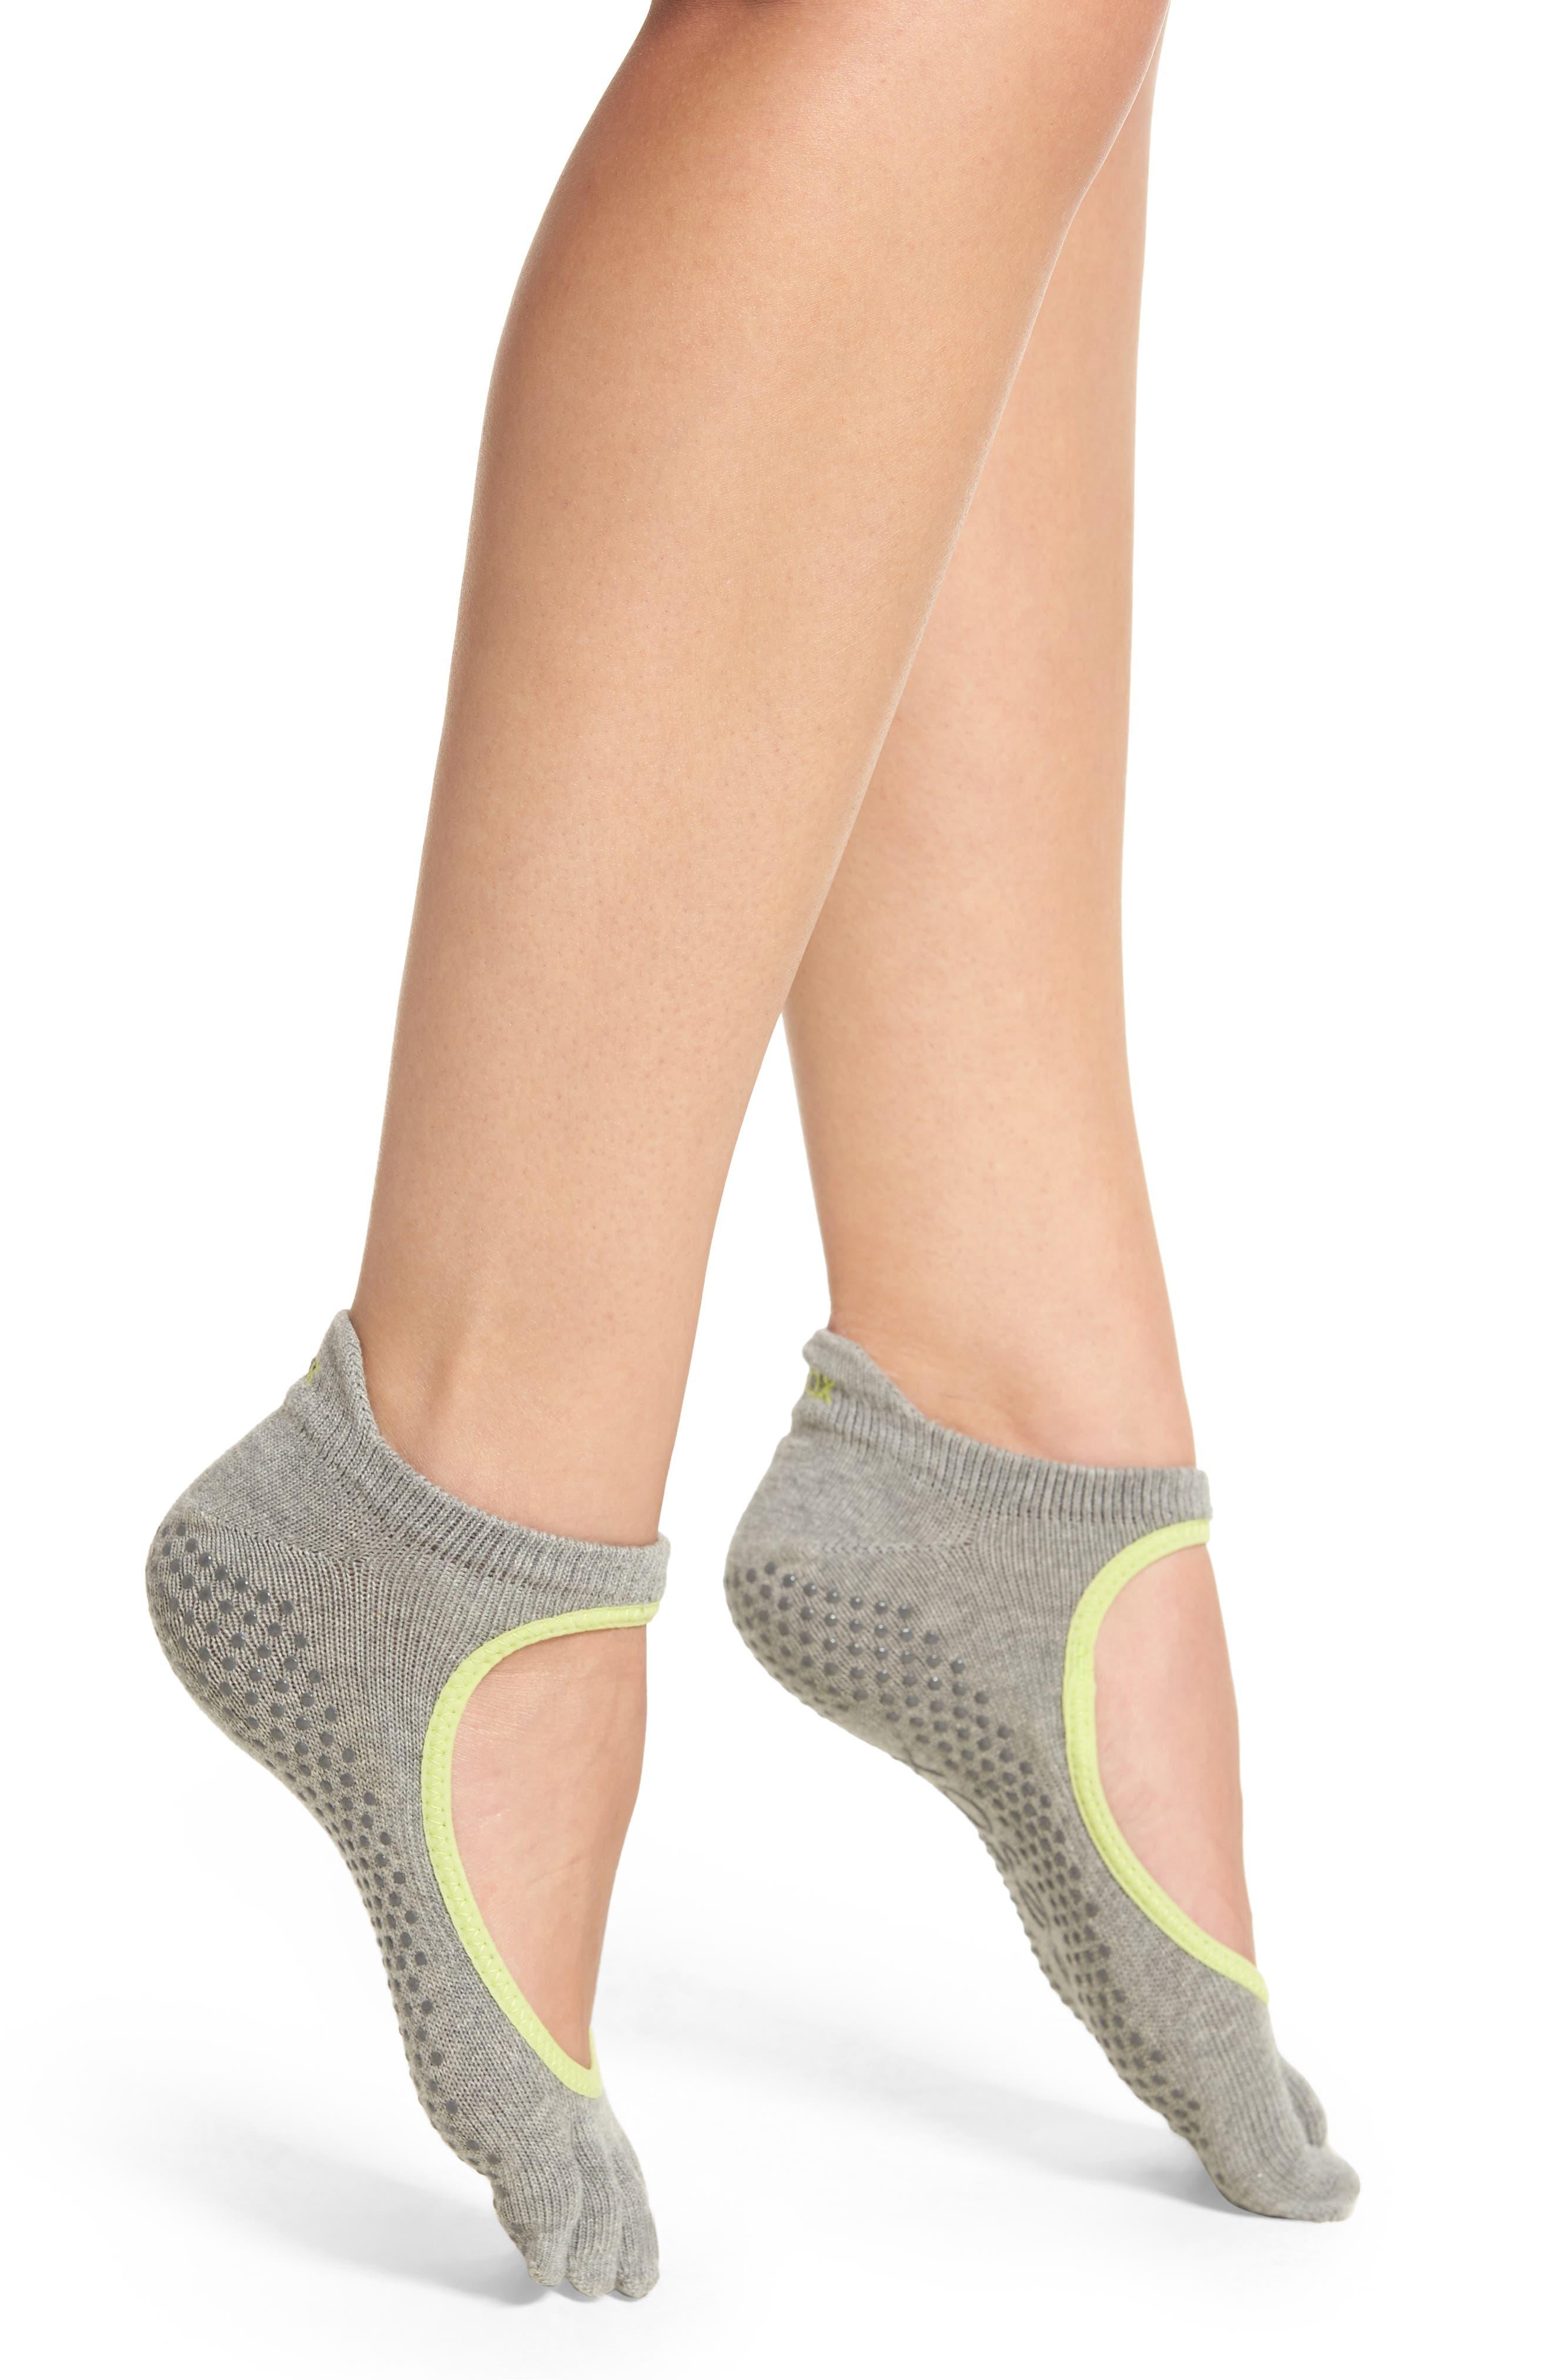 TOESOX Bellarina Full Toe Gripper Socks in Heather Grey/ Lime